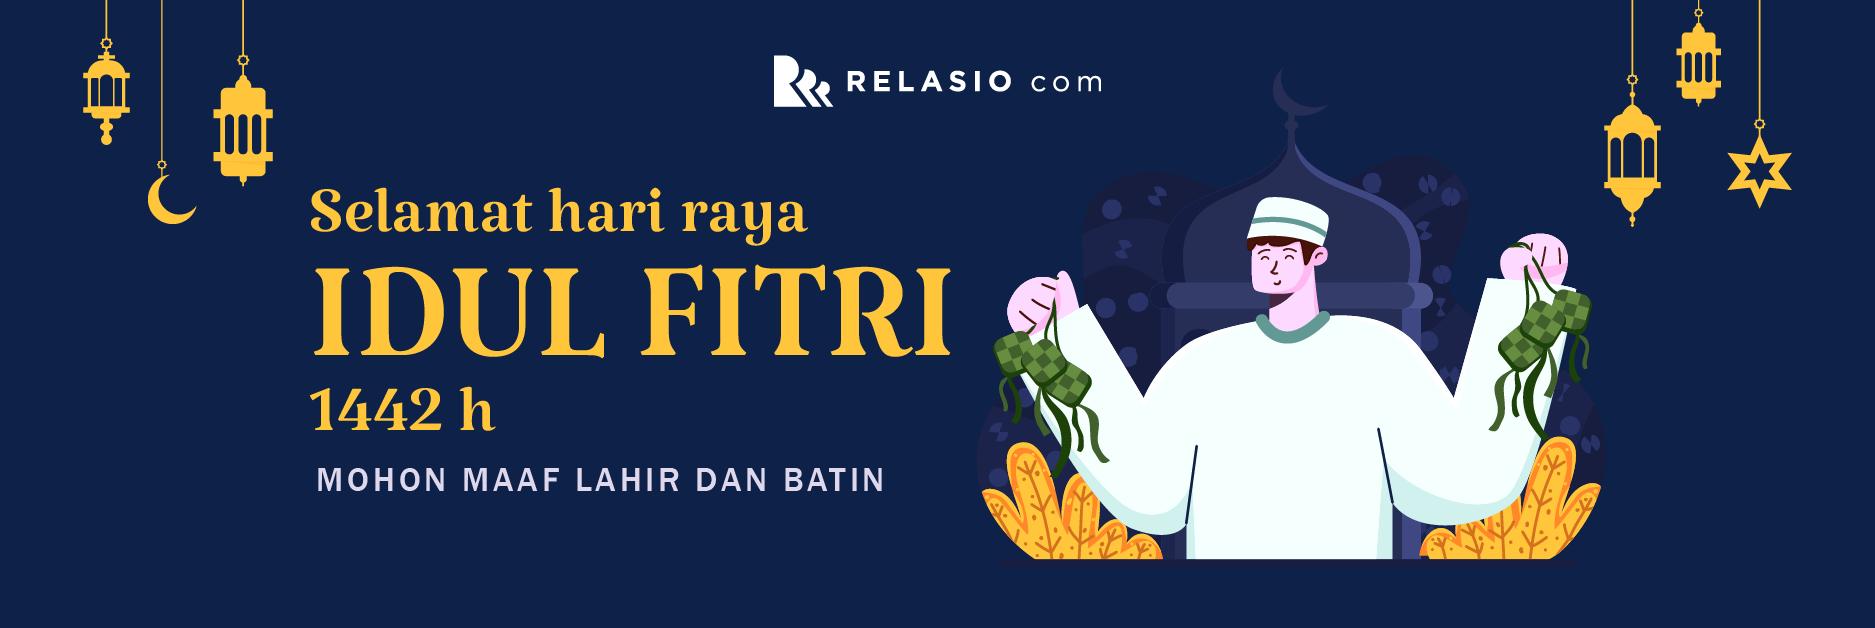 Relasio.com mengucapkan Selamat Idul Fitri 1 Syawal 1442 H